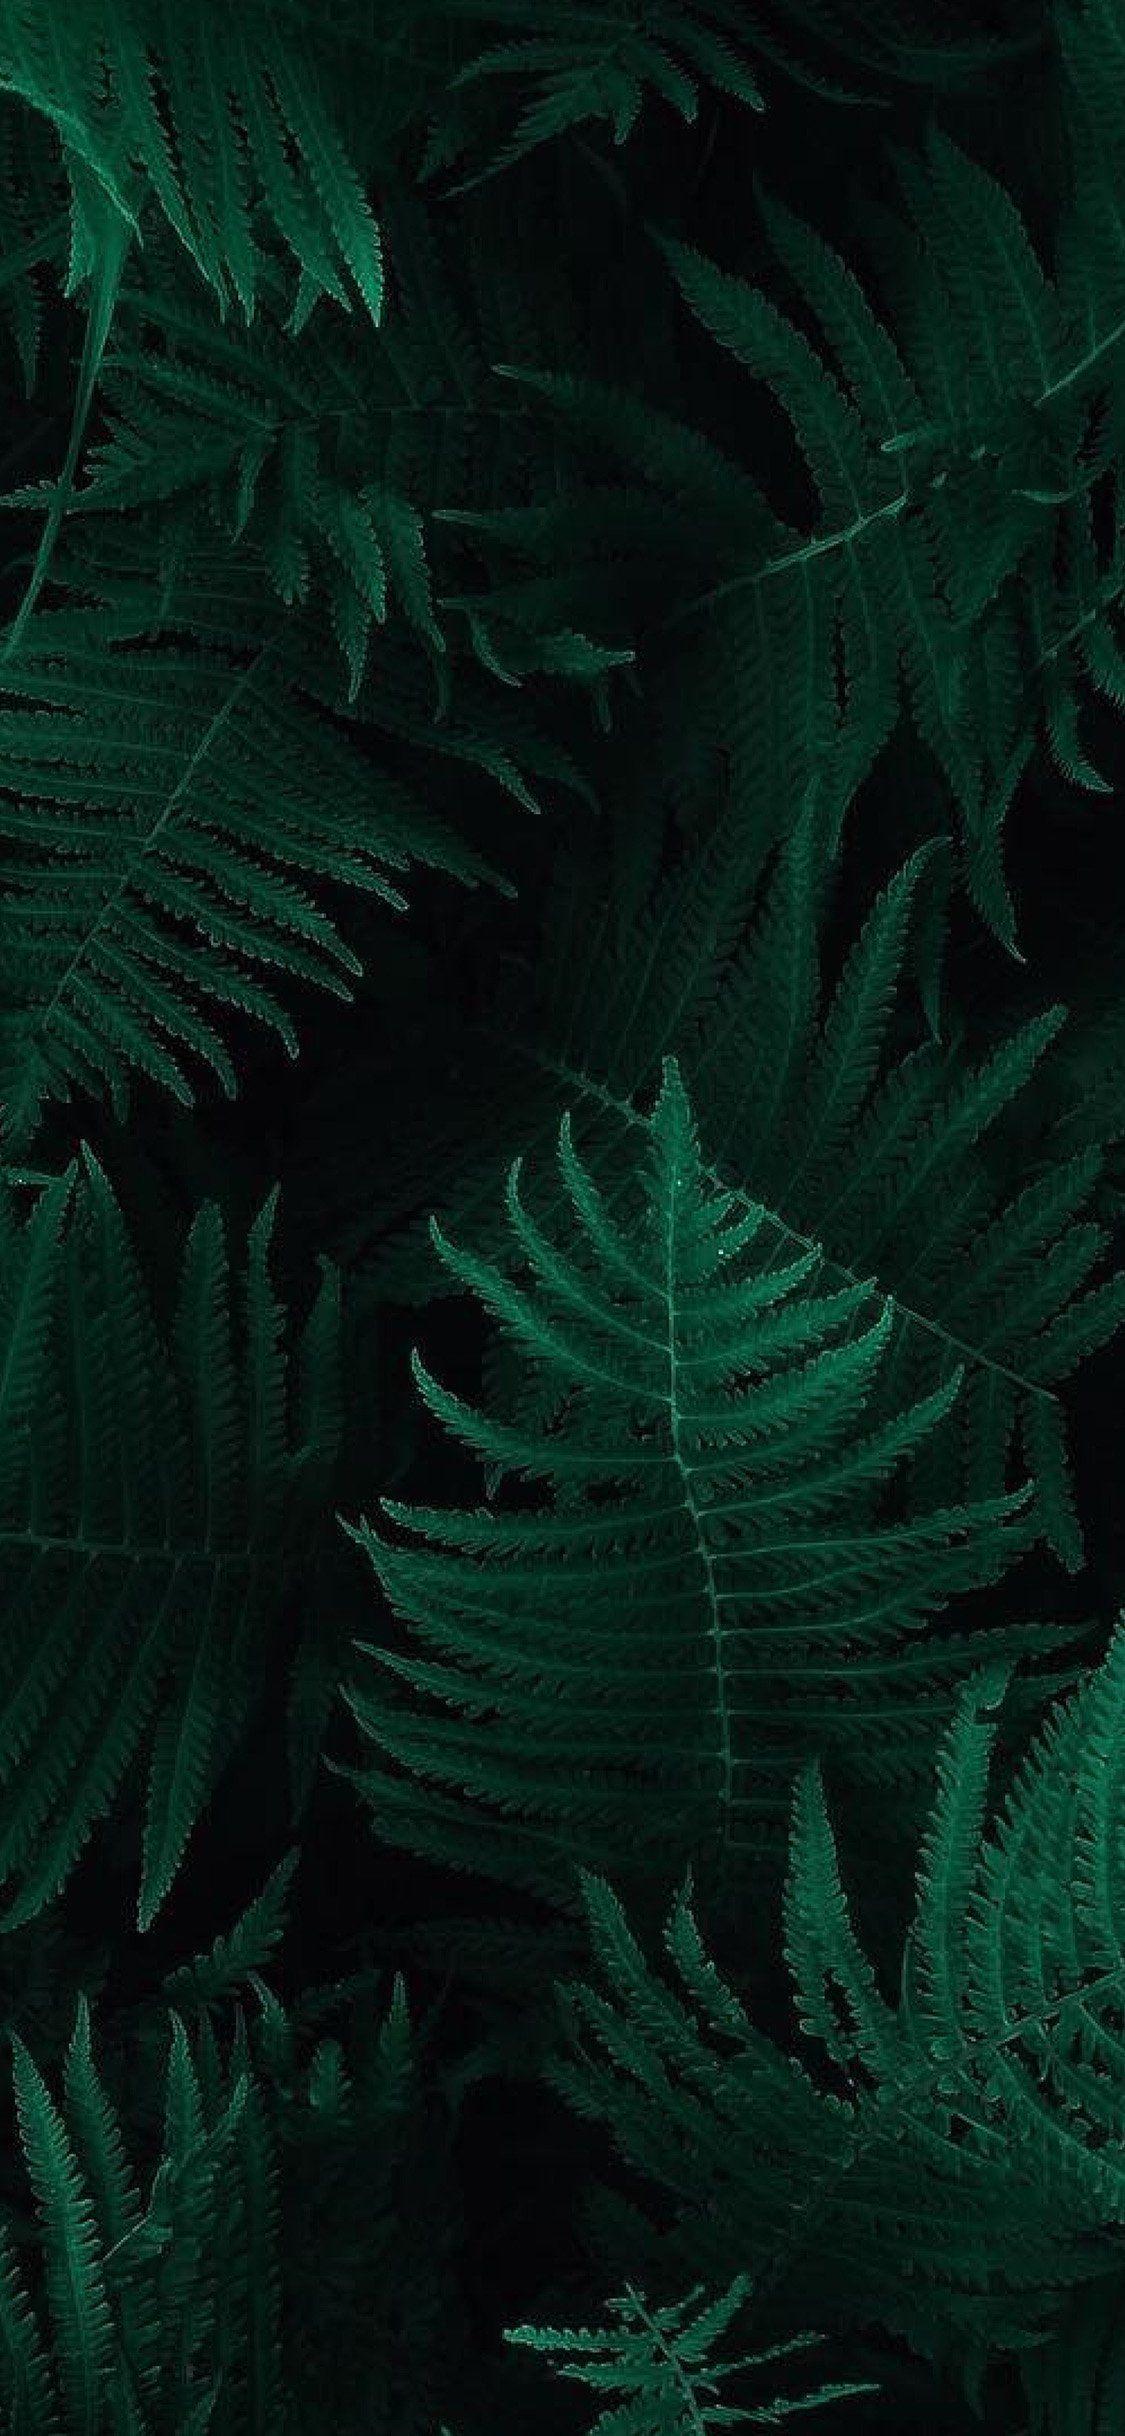 Dark Green Iphone Wallpapers Top Free Dark Green Iphone Backgrounds Wallpaperaccess